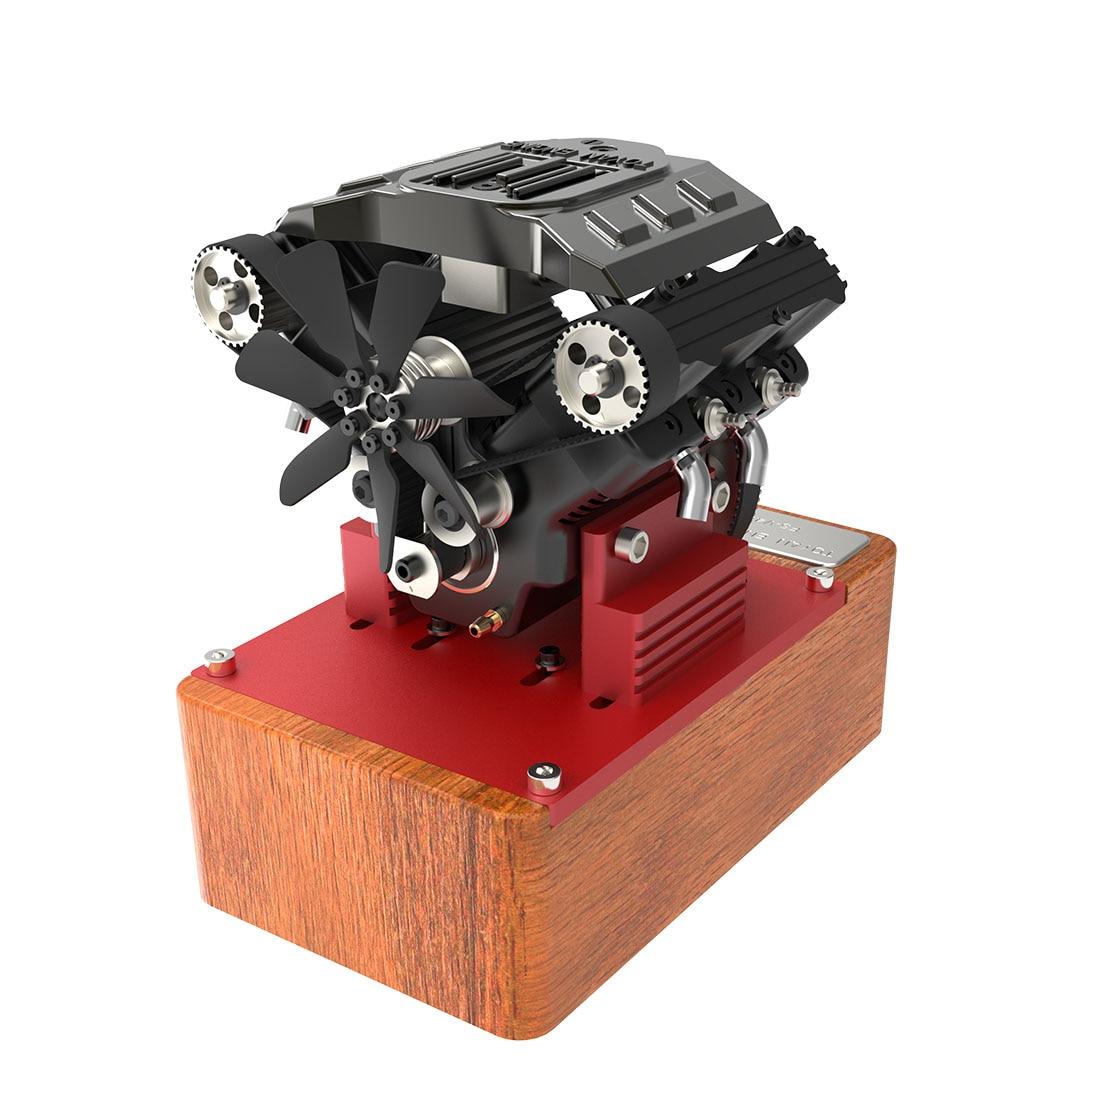 TOYAN V4 Engine Four Cylinder Four Stroke Methanol Engine FS-V400A Engine Without T Plug Battery For 1:10 1:12 1:14 RC Car